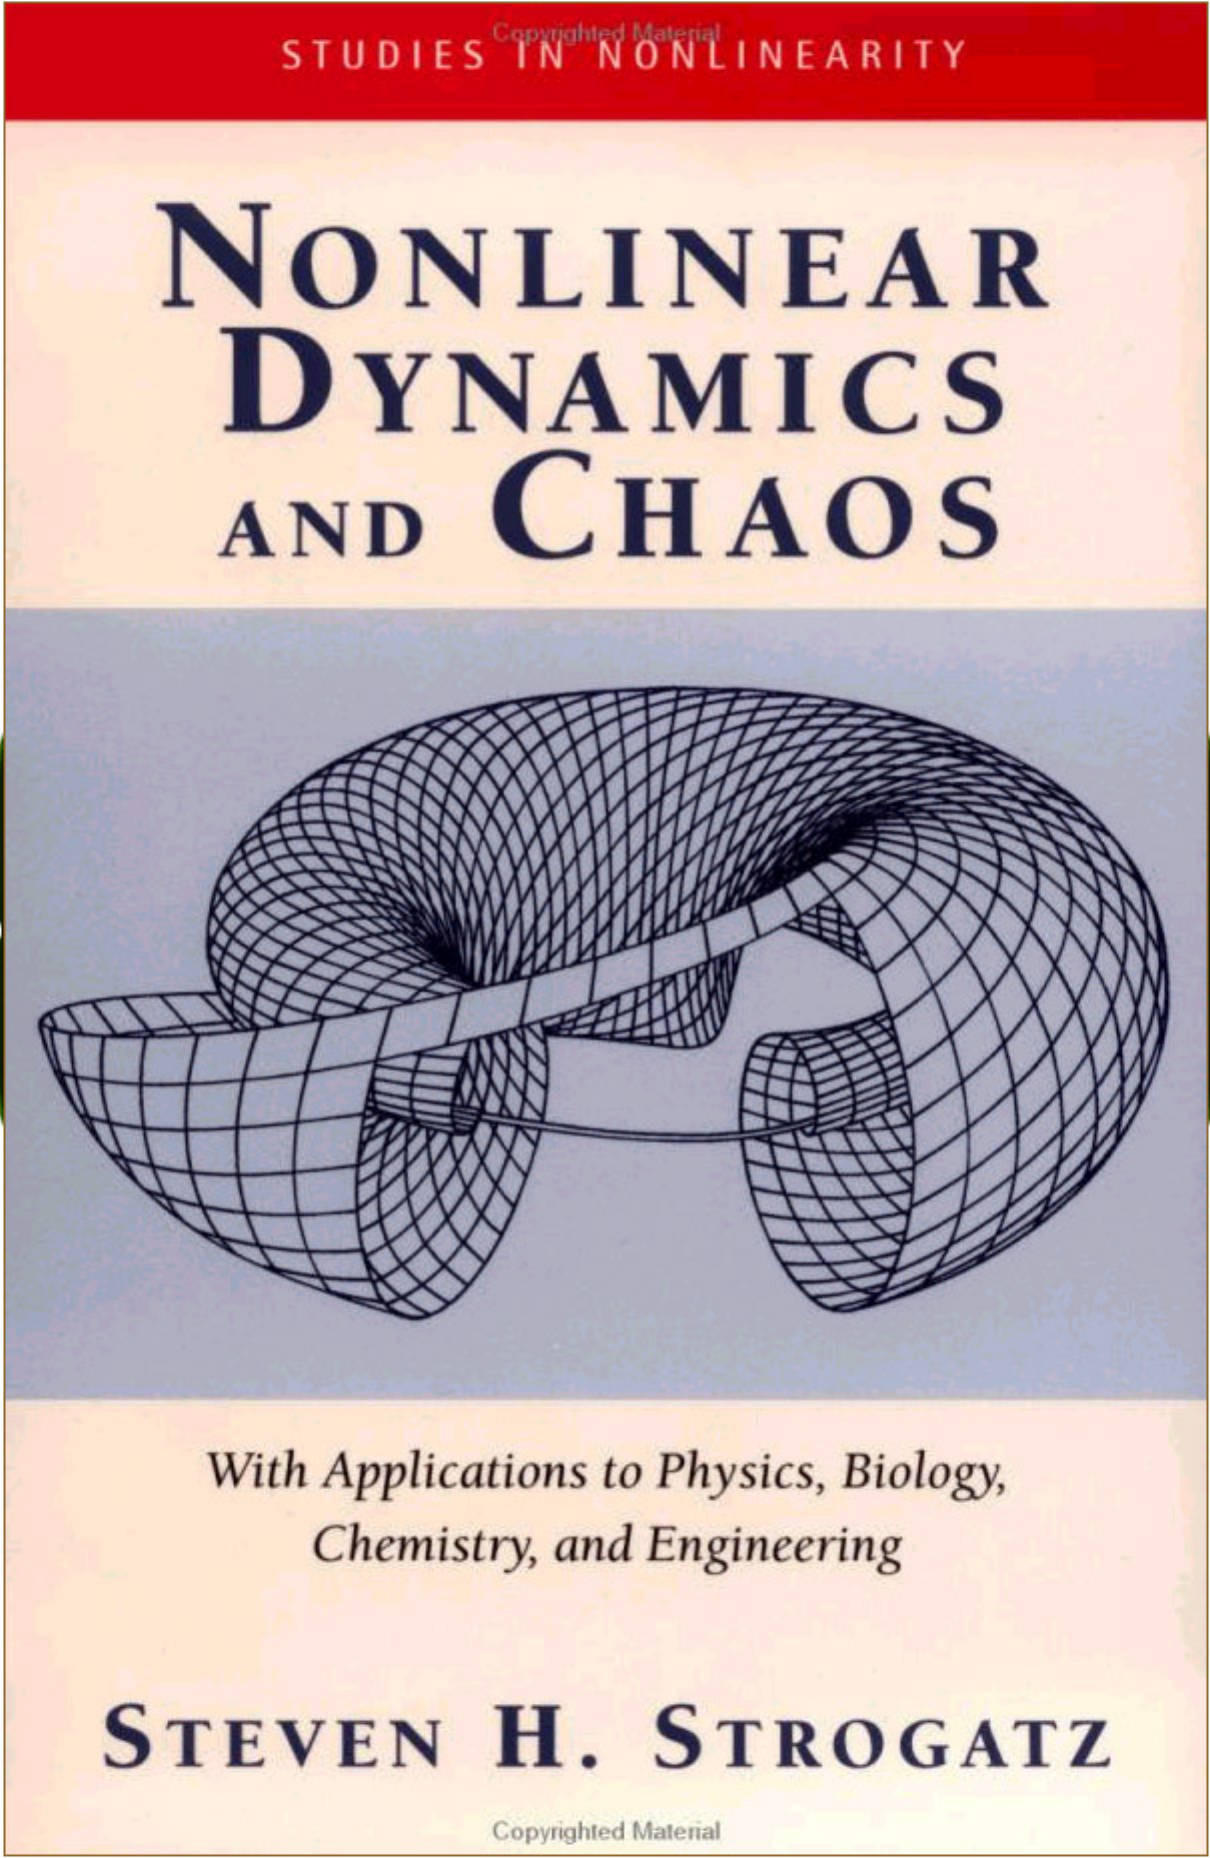 Nonlinear Dynamics And Chaos Pdf Strogatz